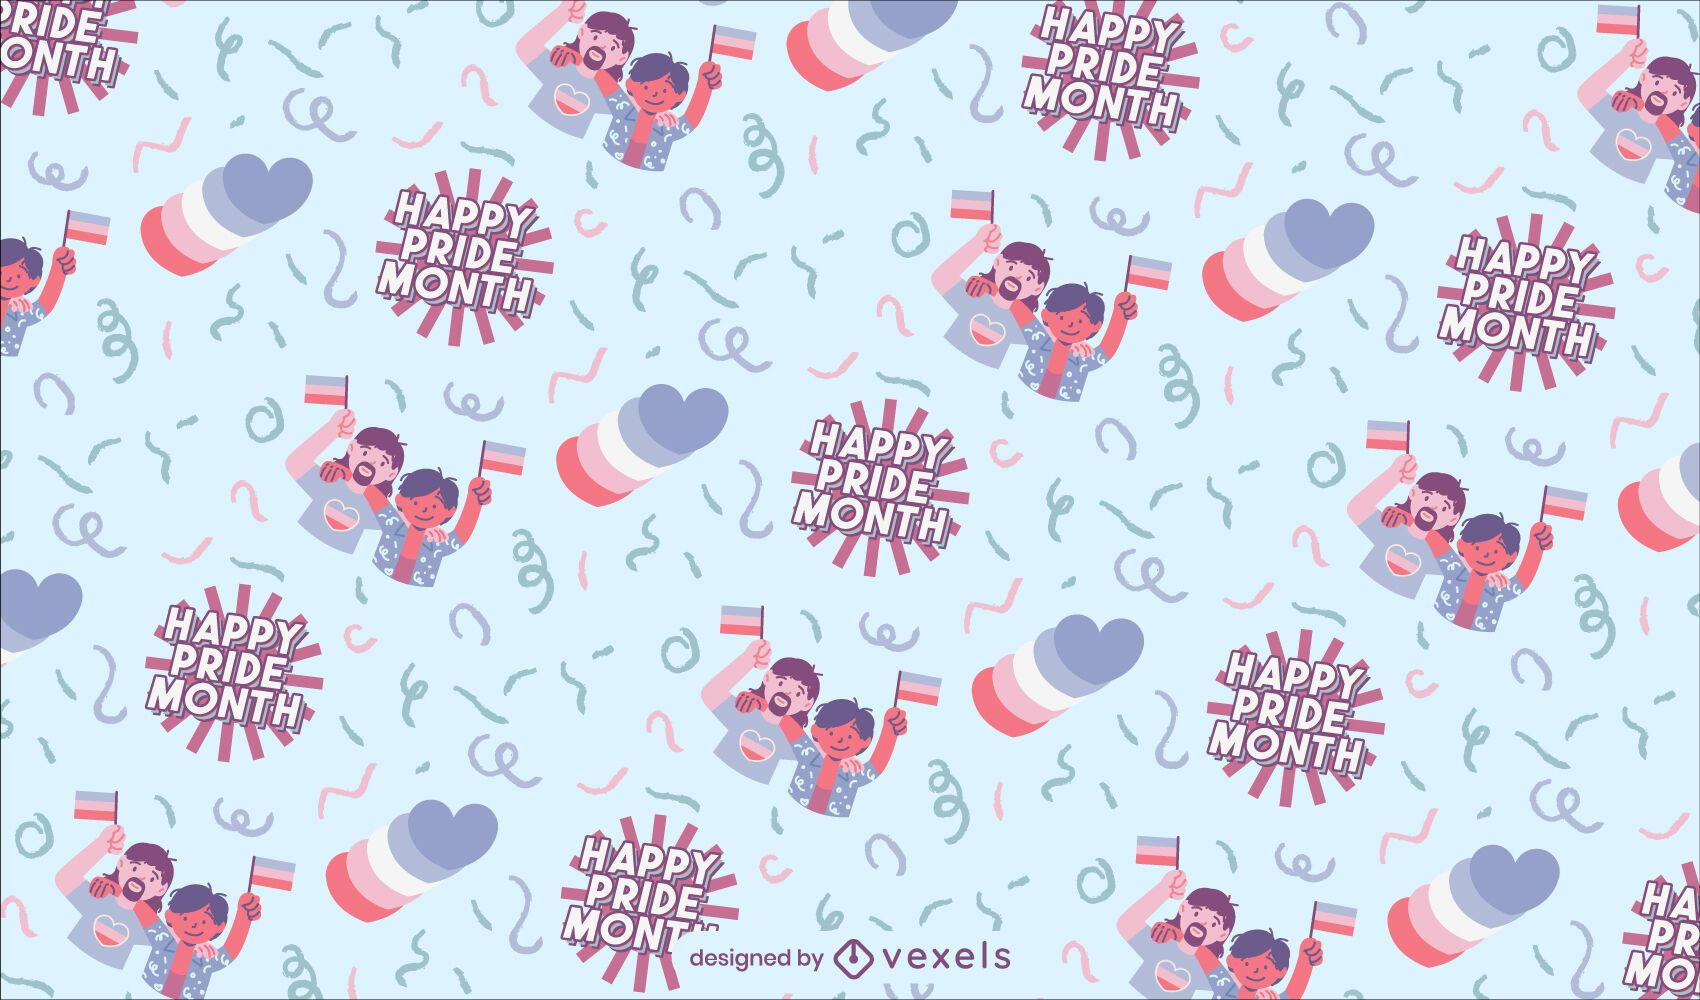 Happy pride month lgbt pattern design